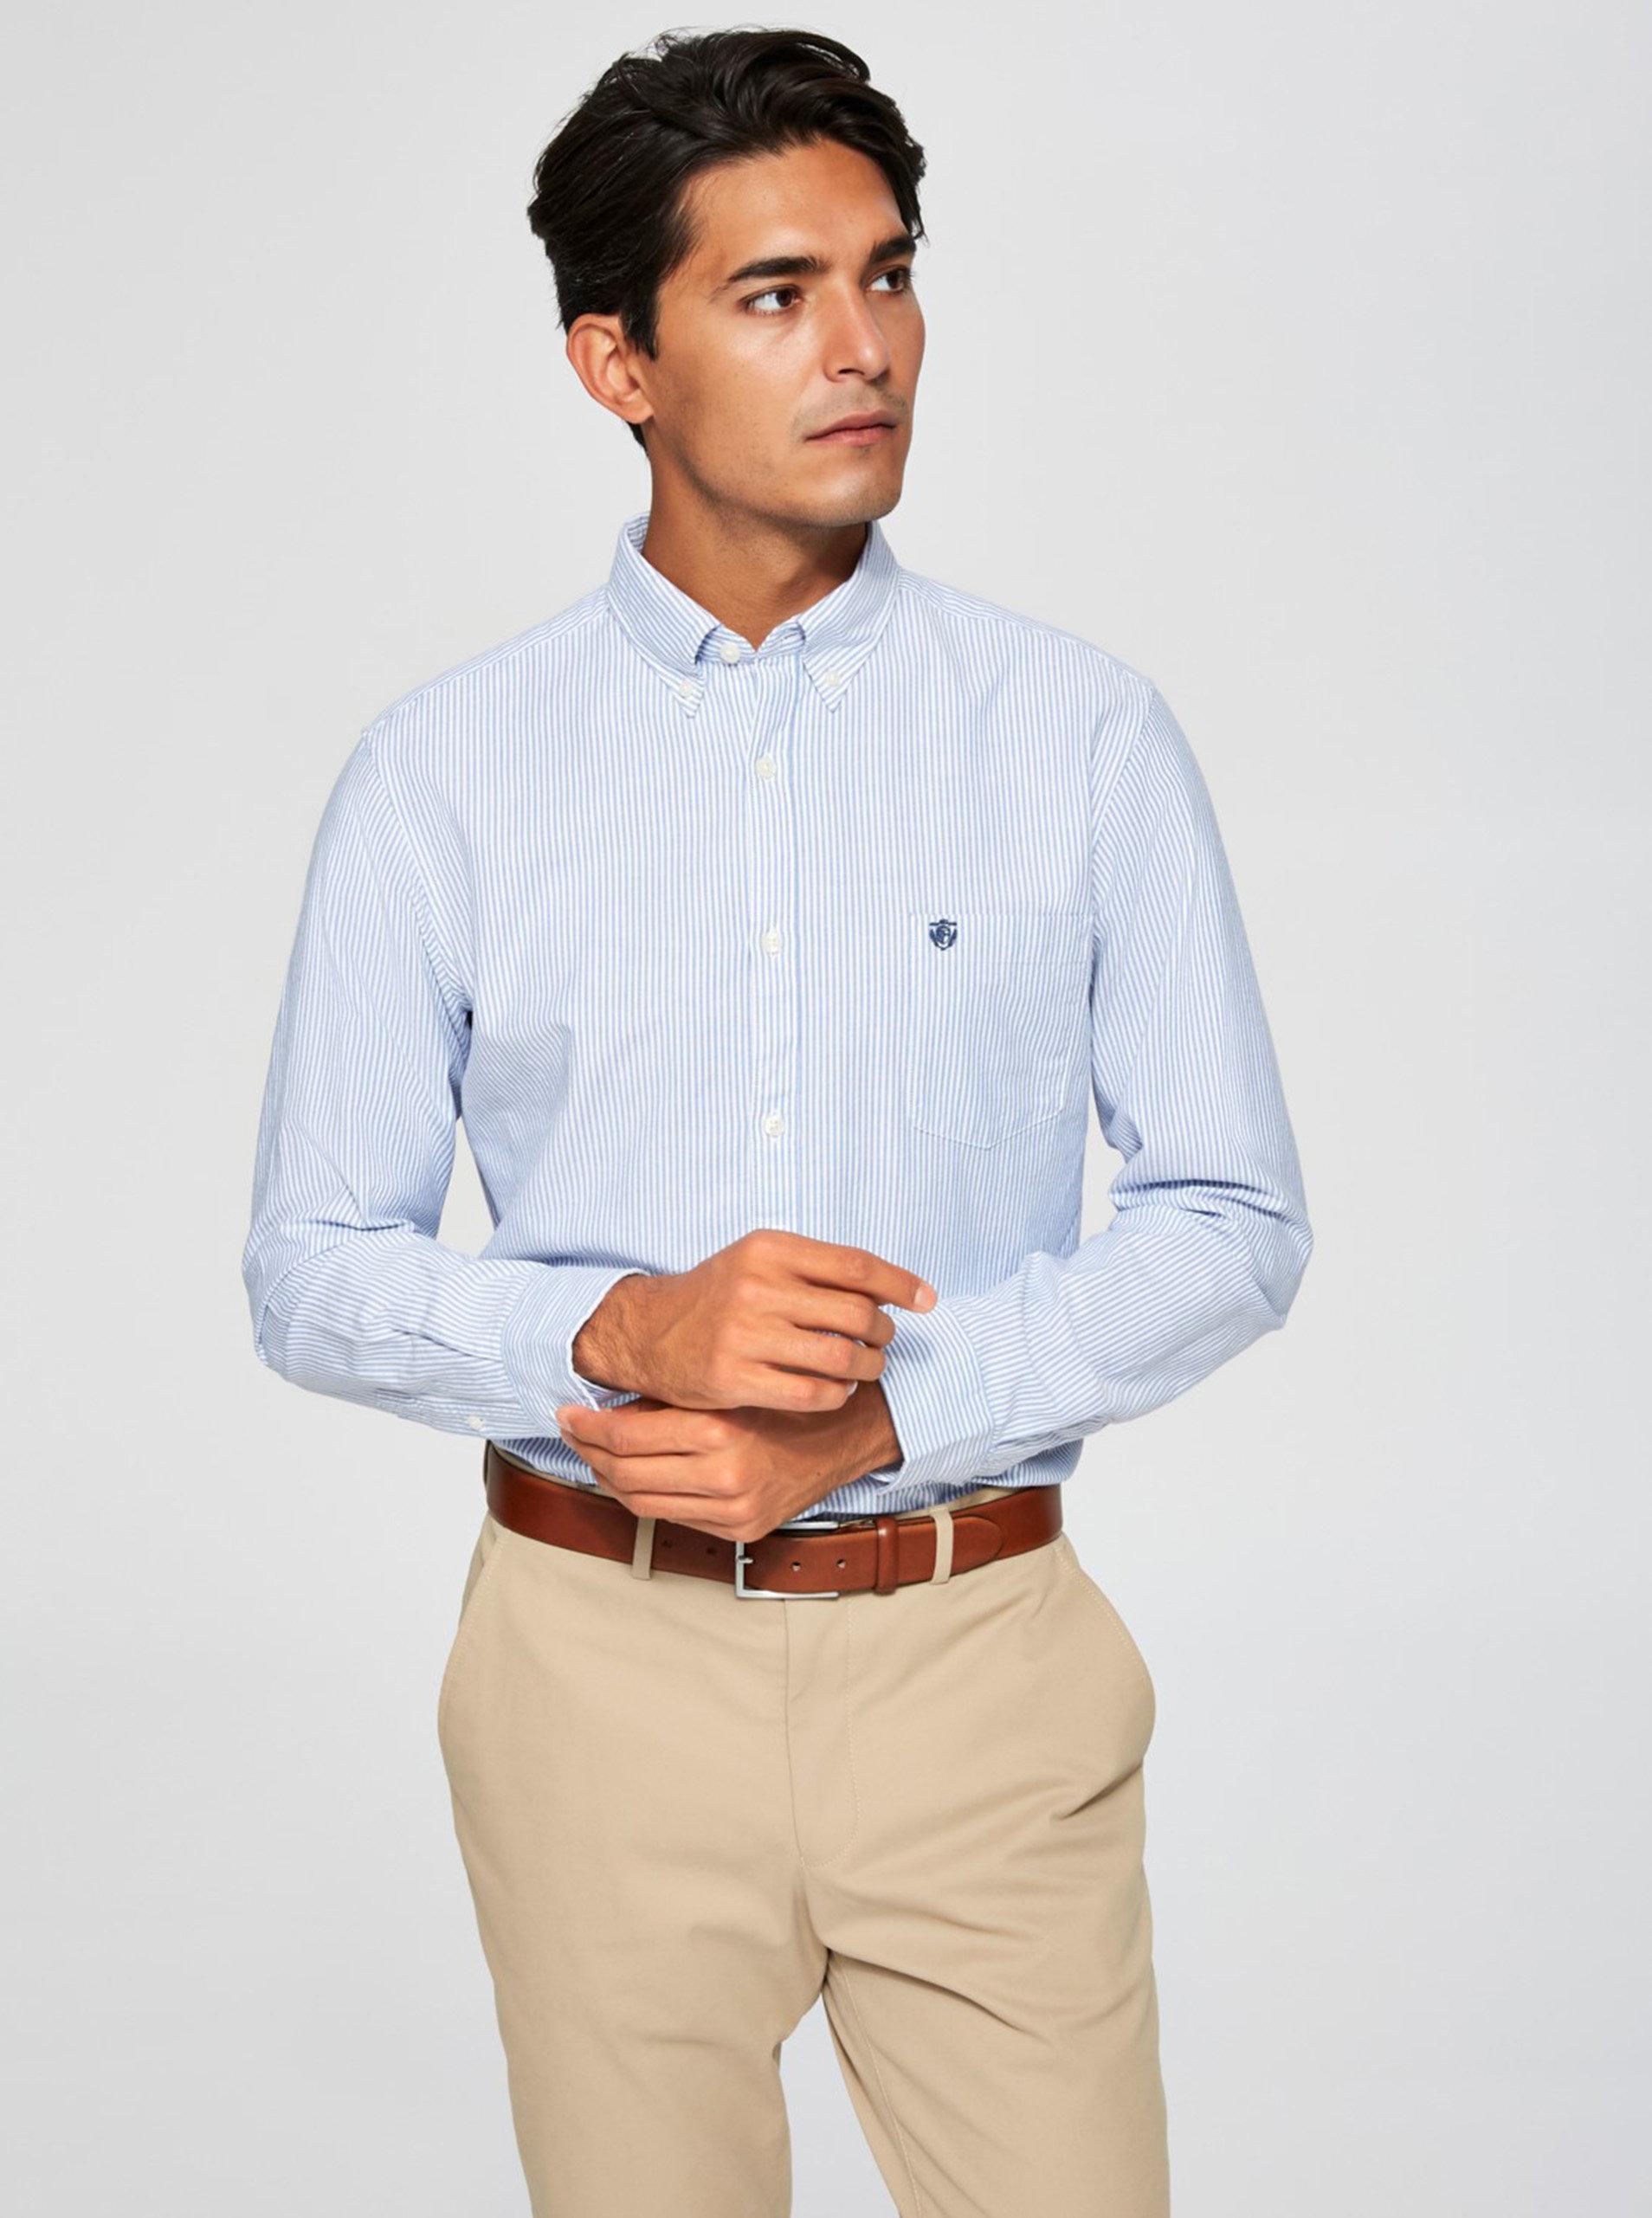 7c4b02acc597 Svetlomodrá pruhovaná košeľa Selected Homme Collect ...